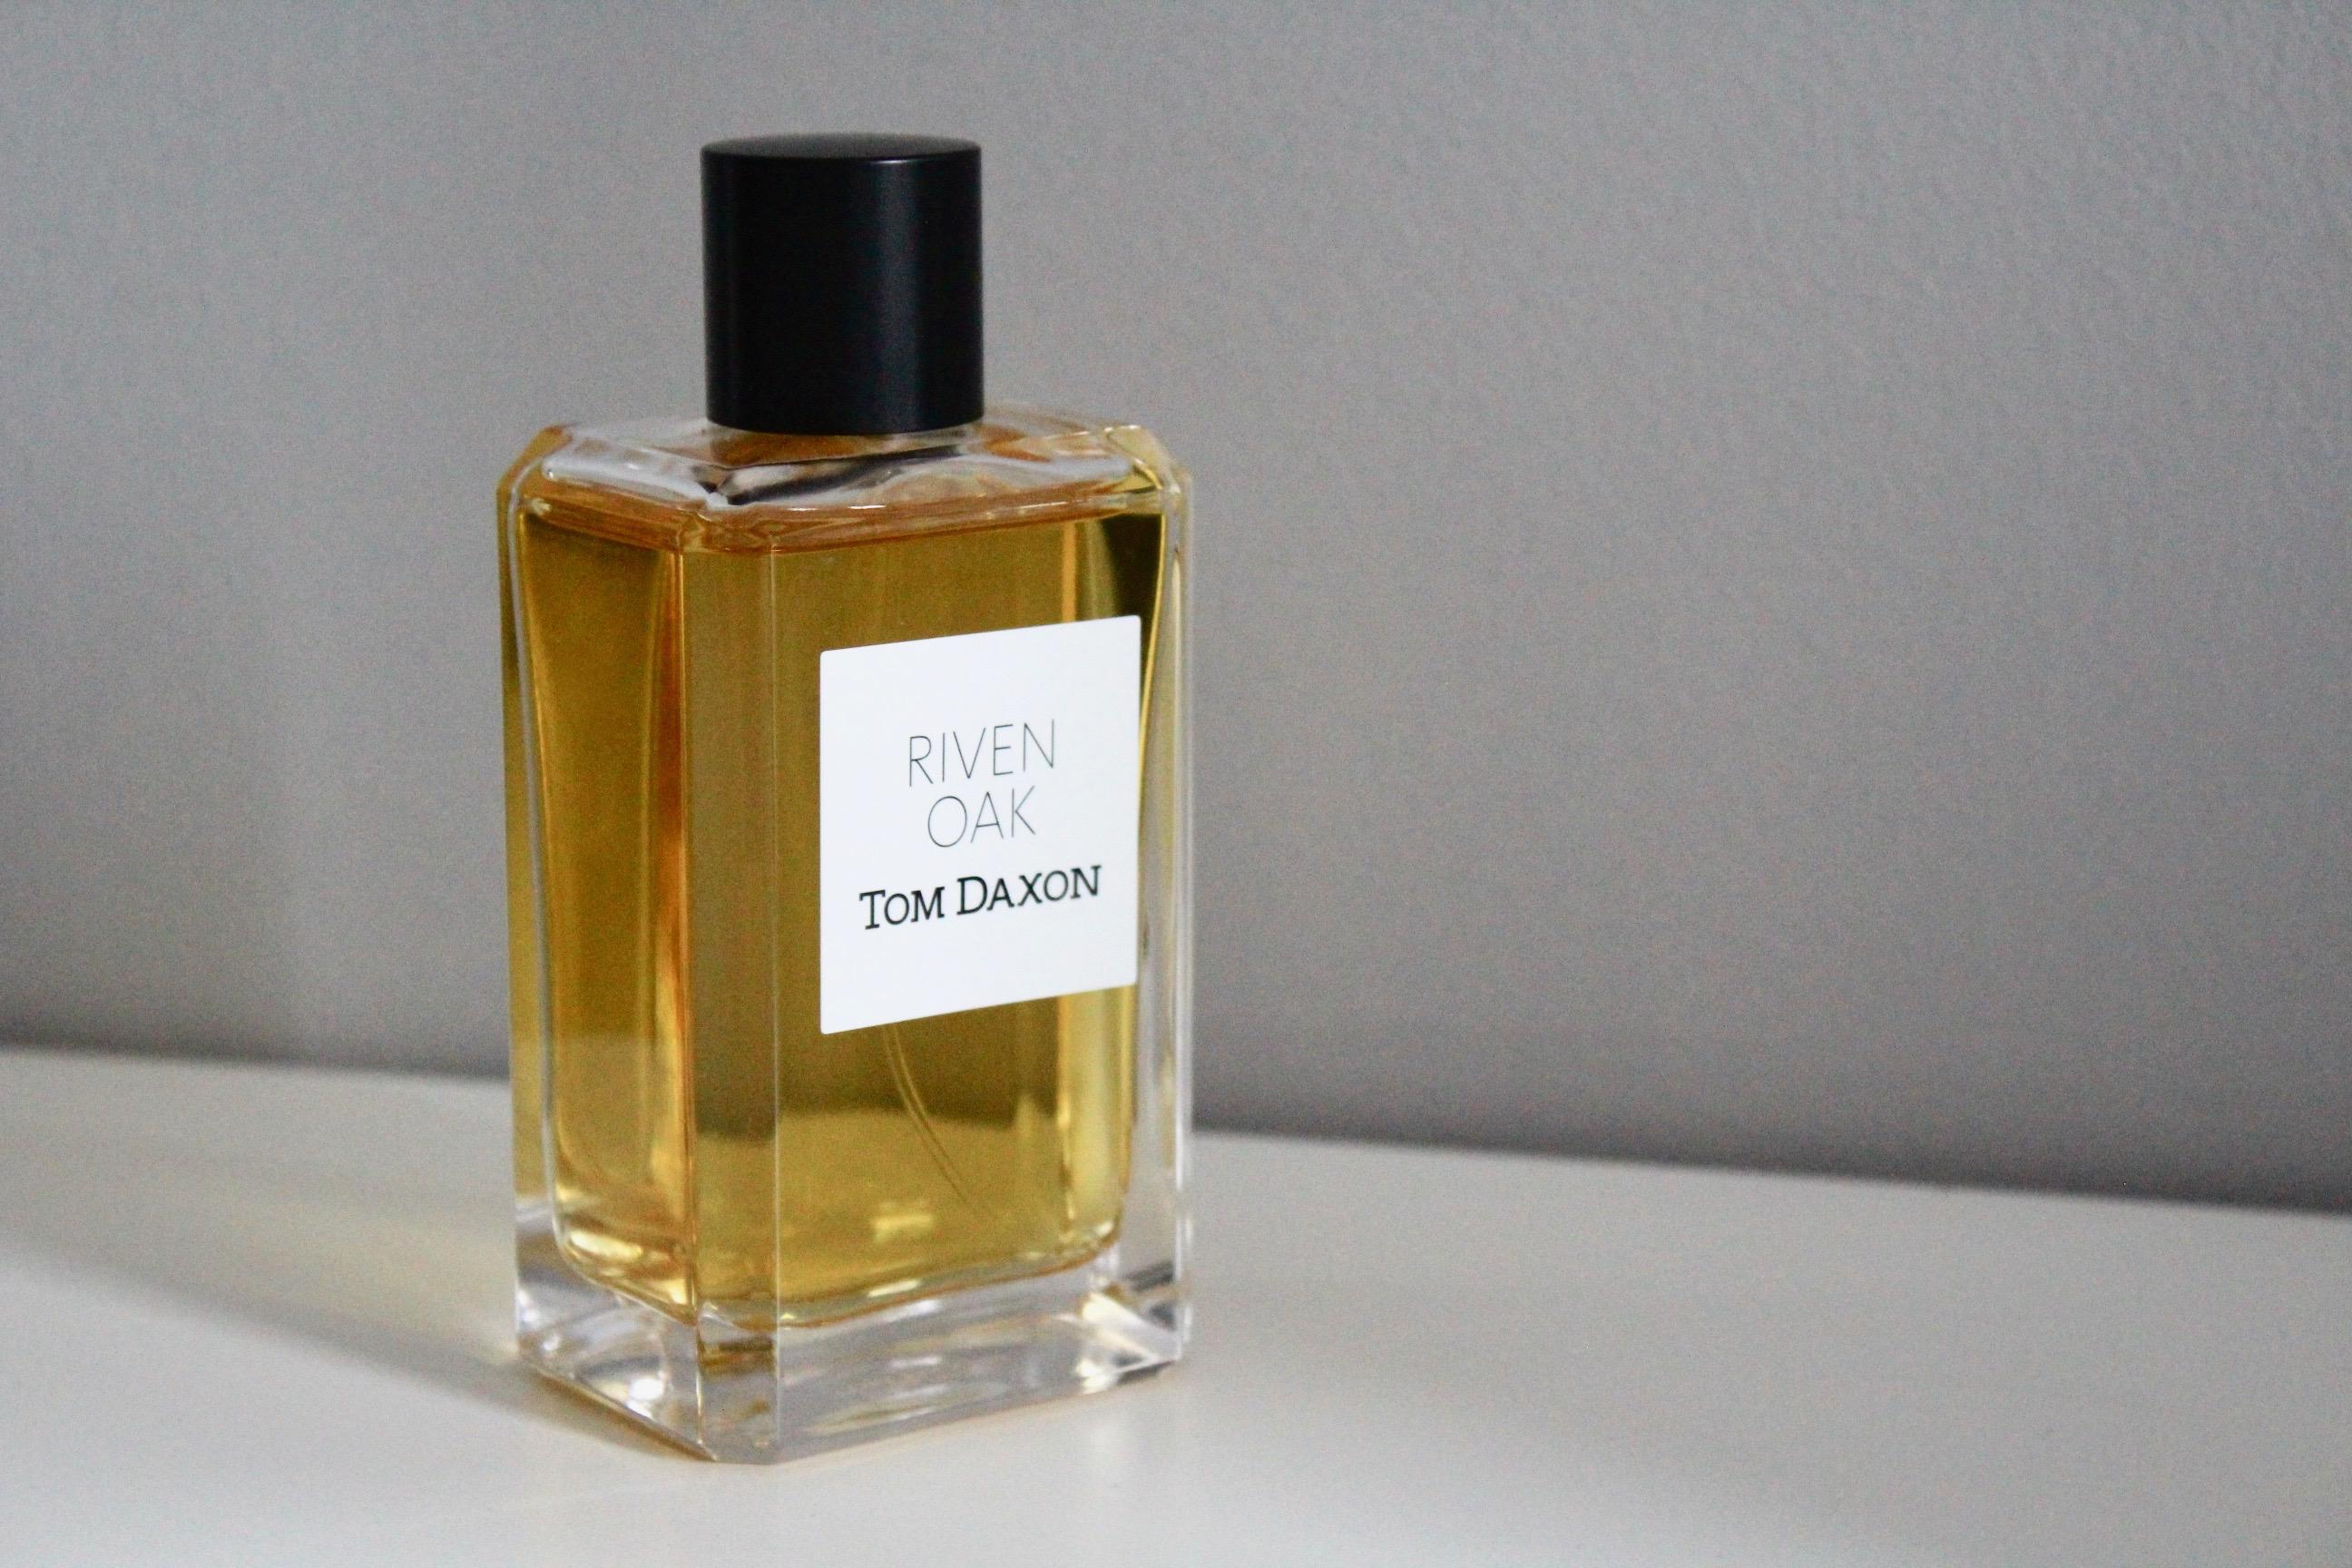 Perfume Review Riven Oak by Tom Daxon – The Candy Perfume Boy